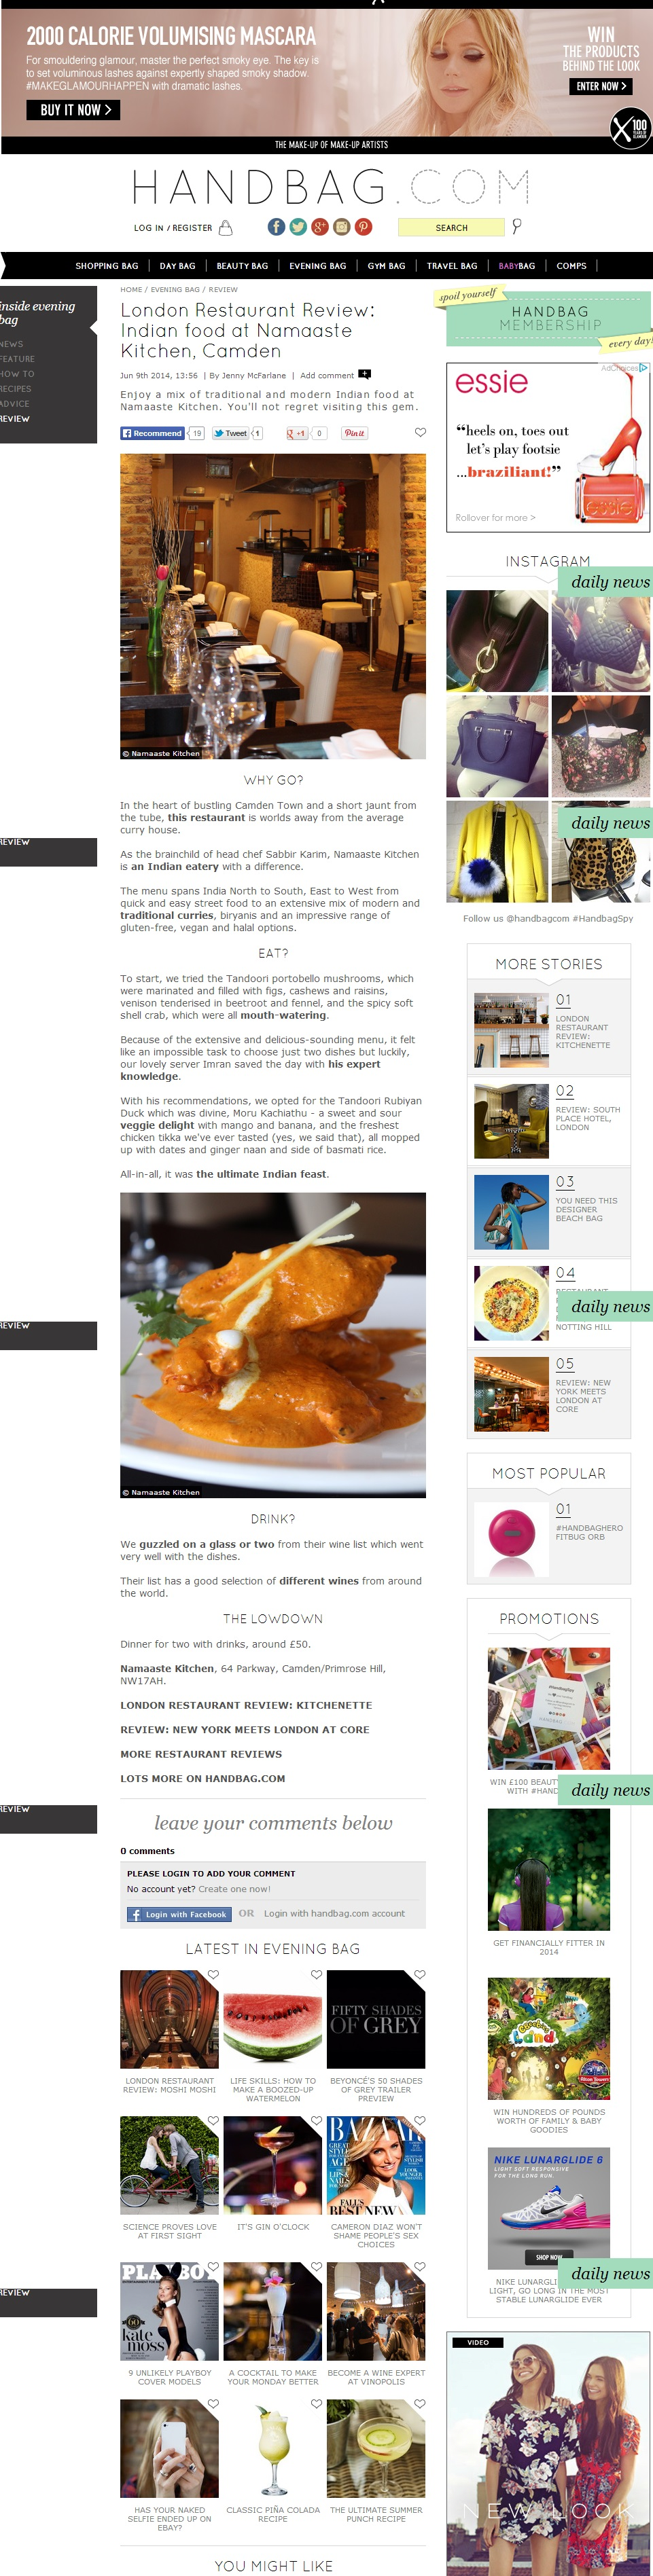 screencapture-www-handbag-com-evening-bag-review-a576422-london-restaurant-review-indian-food-at-namaaste-kitchen-camden-html